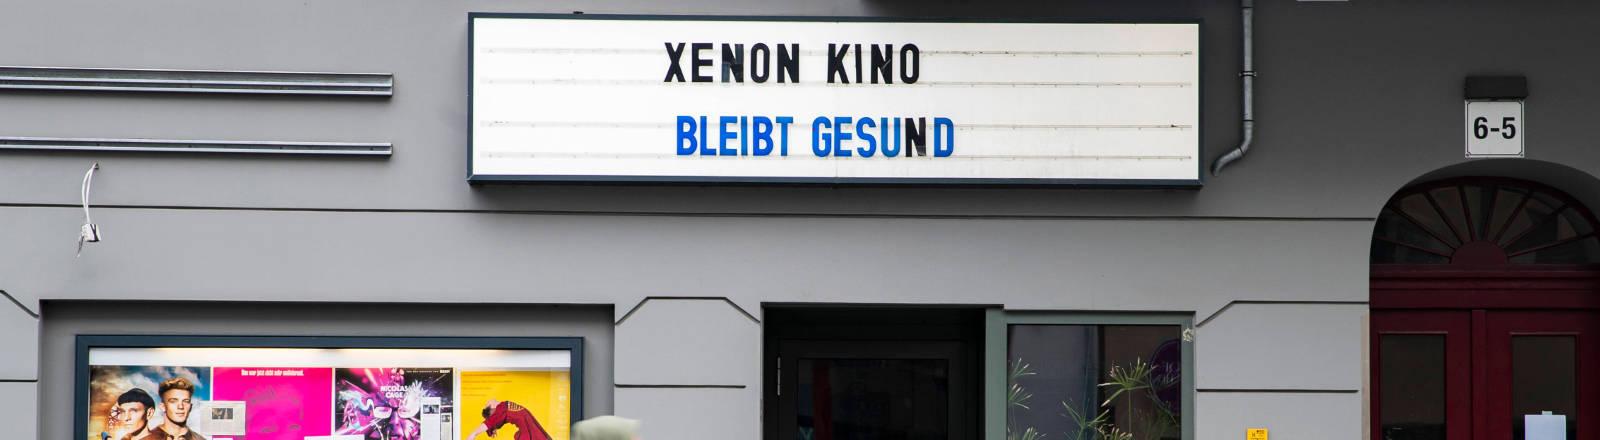 Geschlossenes Kino